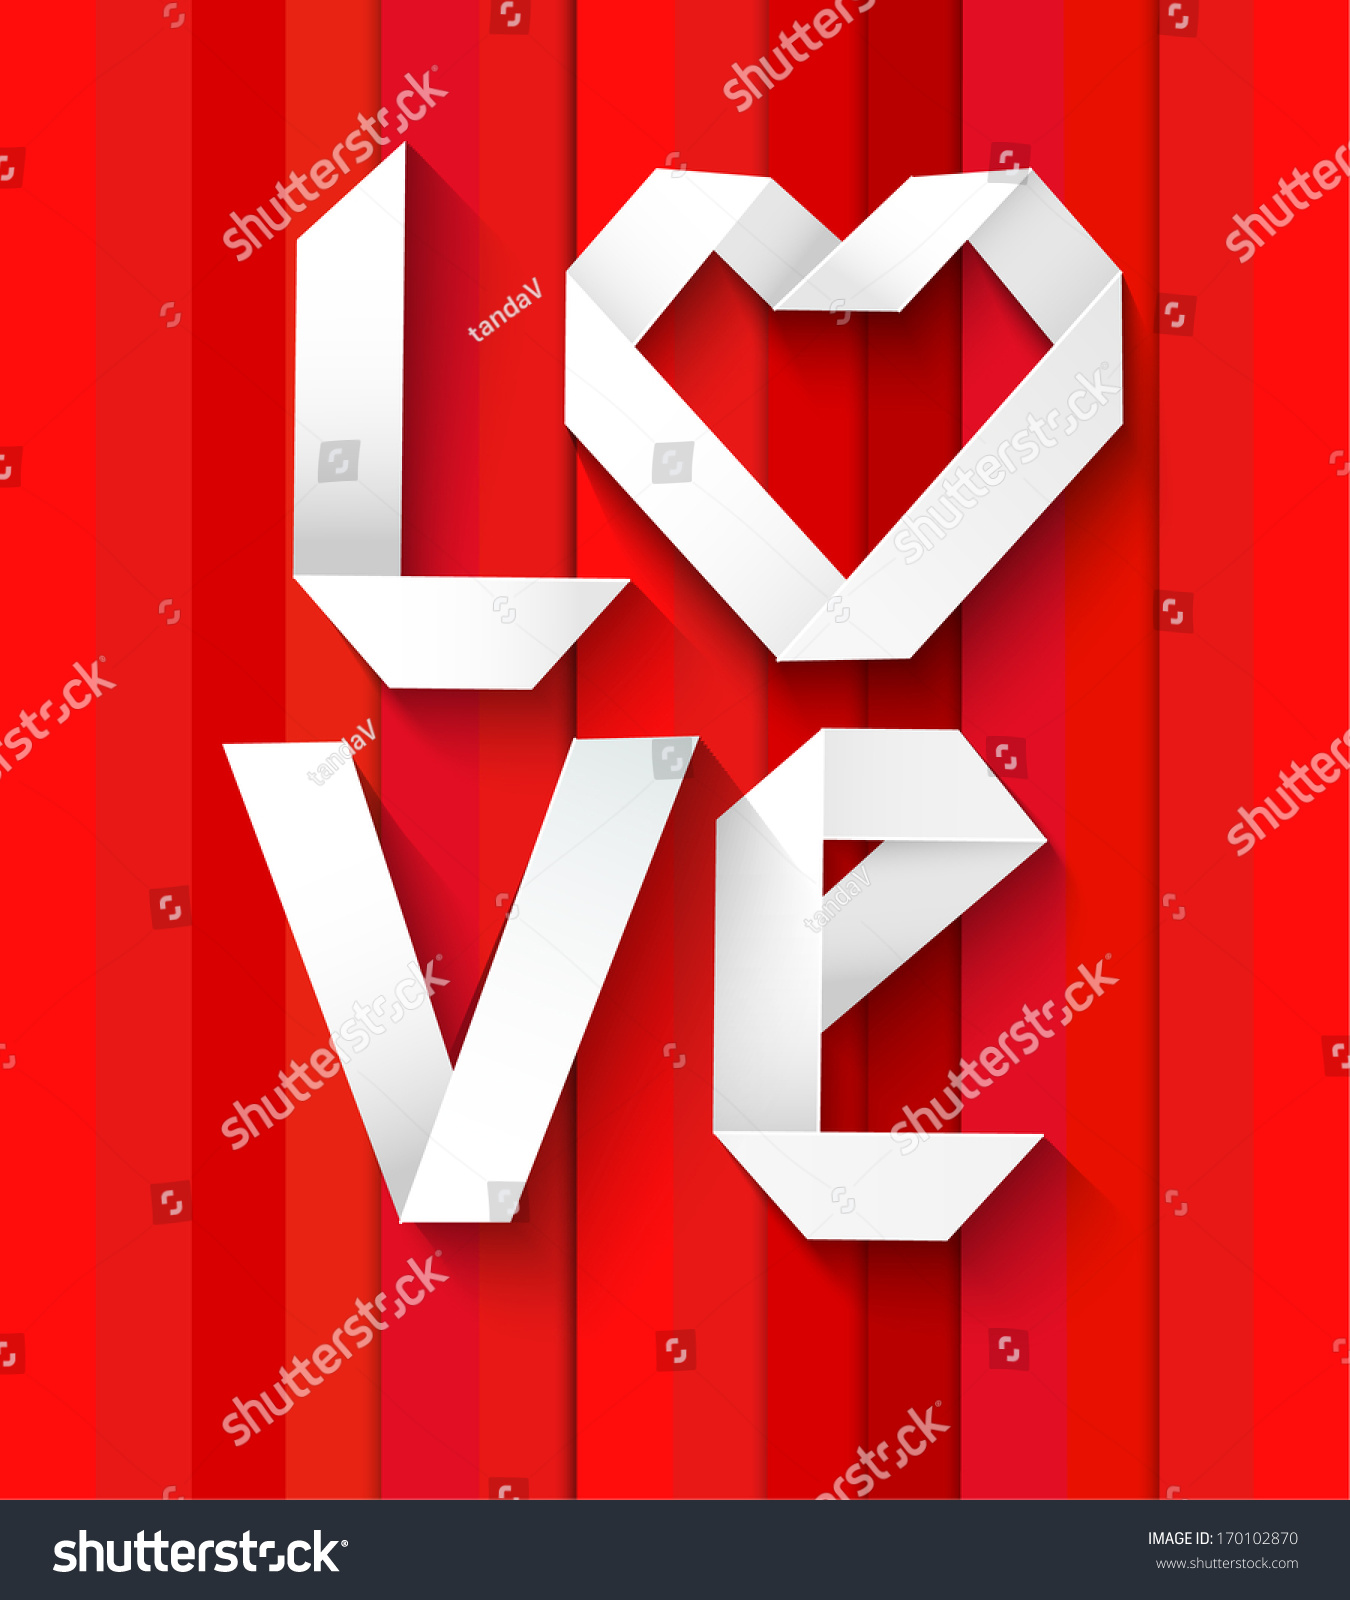 Concept essay on love